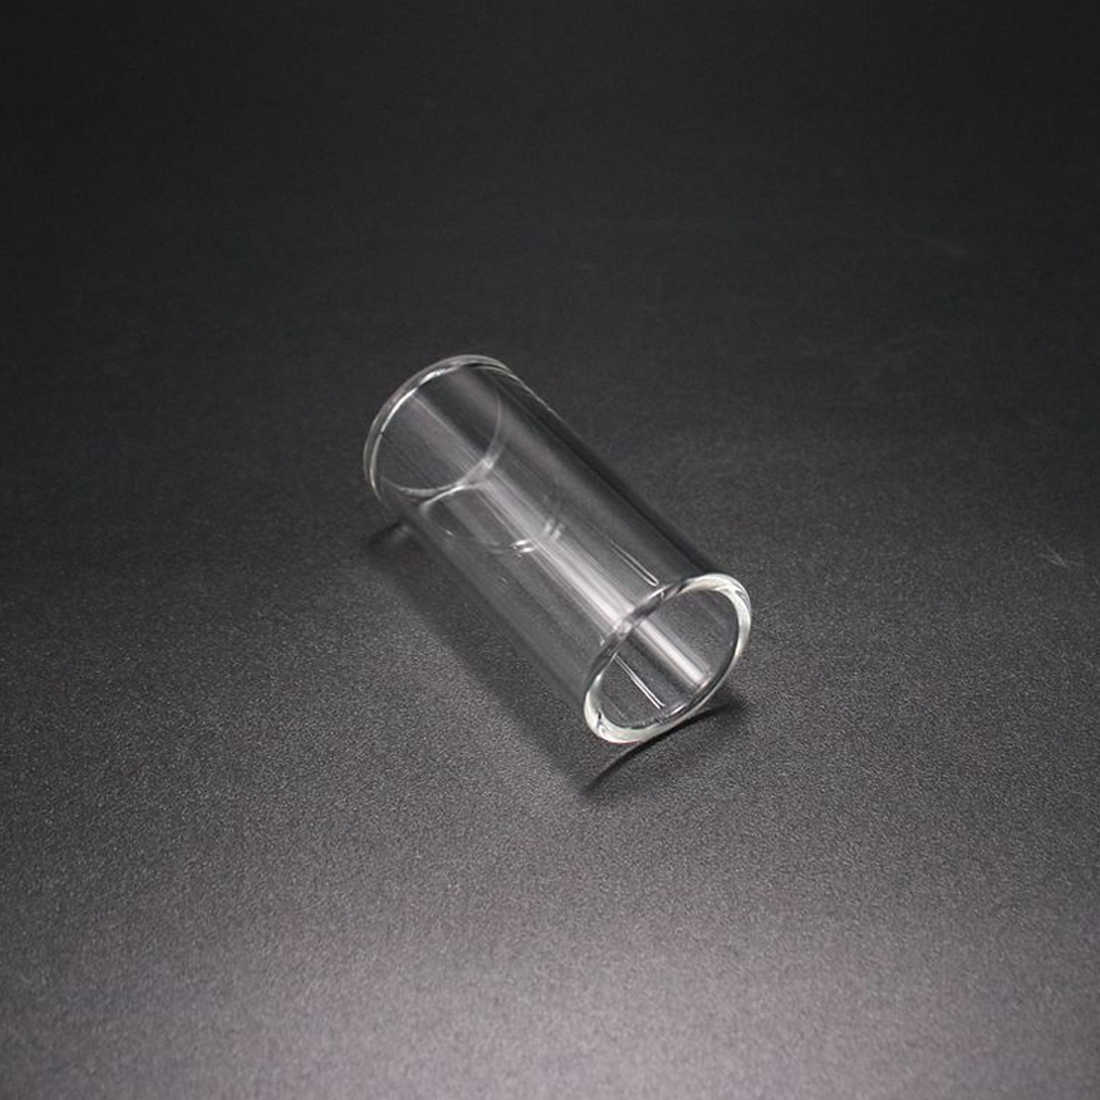 18mm/22mm portaobjetos de vidrio accesorios de guitarra de deslizadores de 60mm de longitud de guitarra de cuna